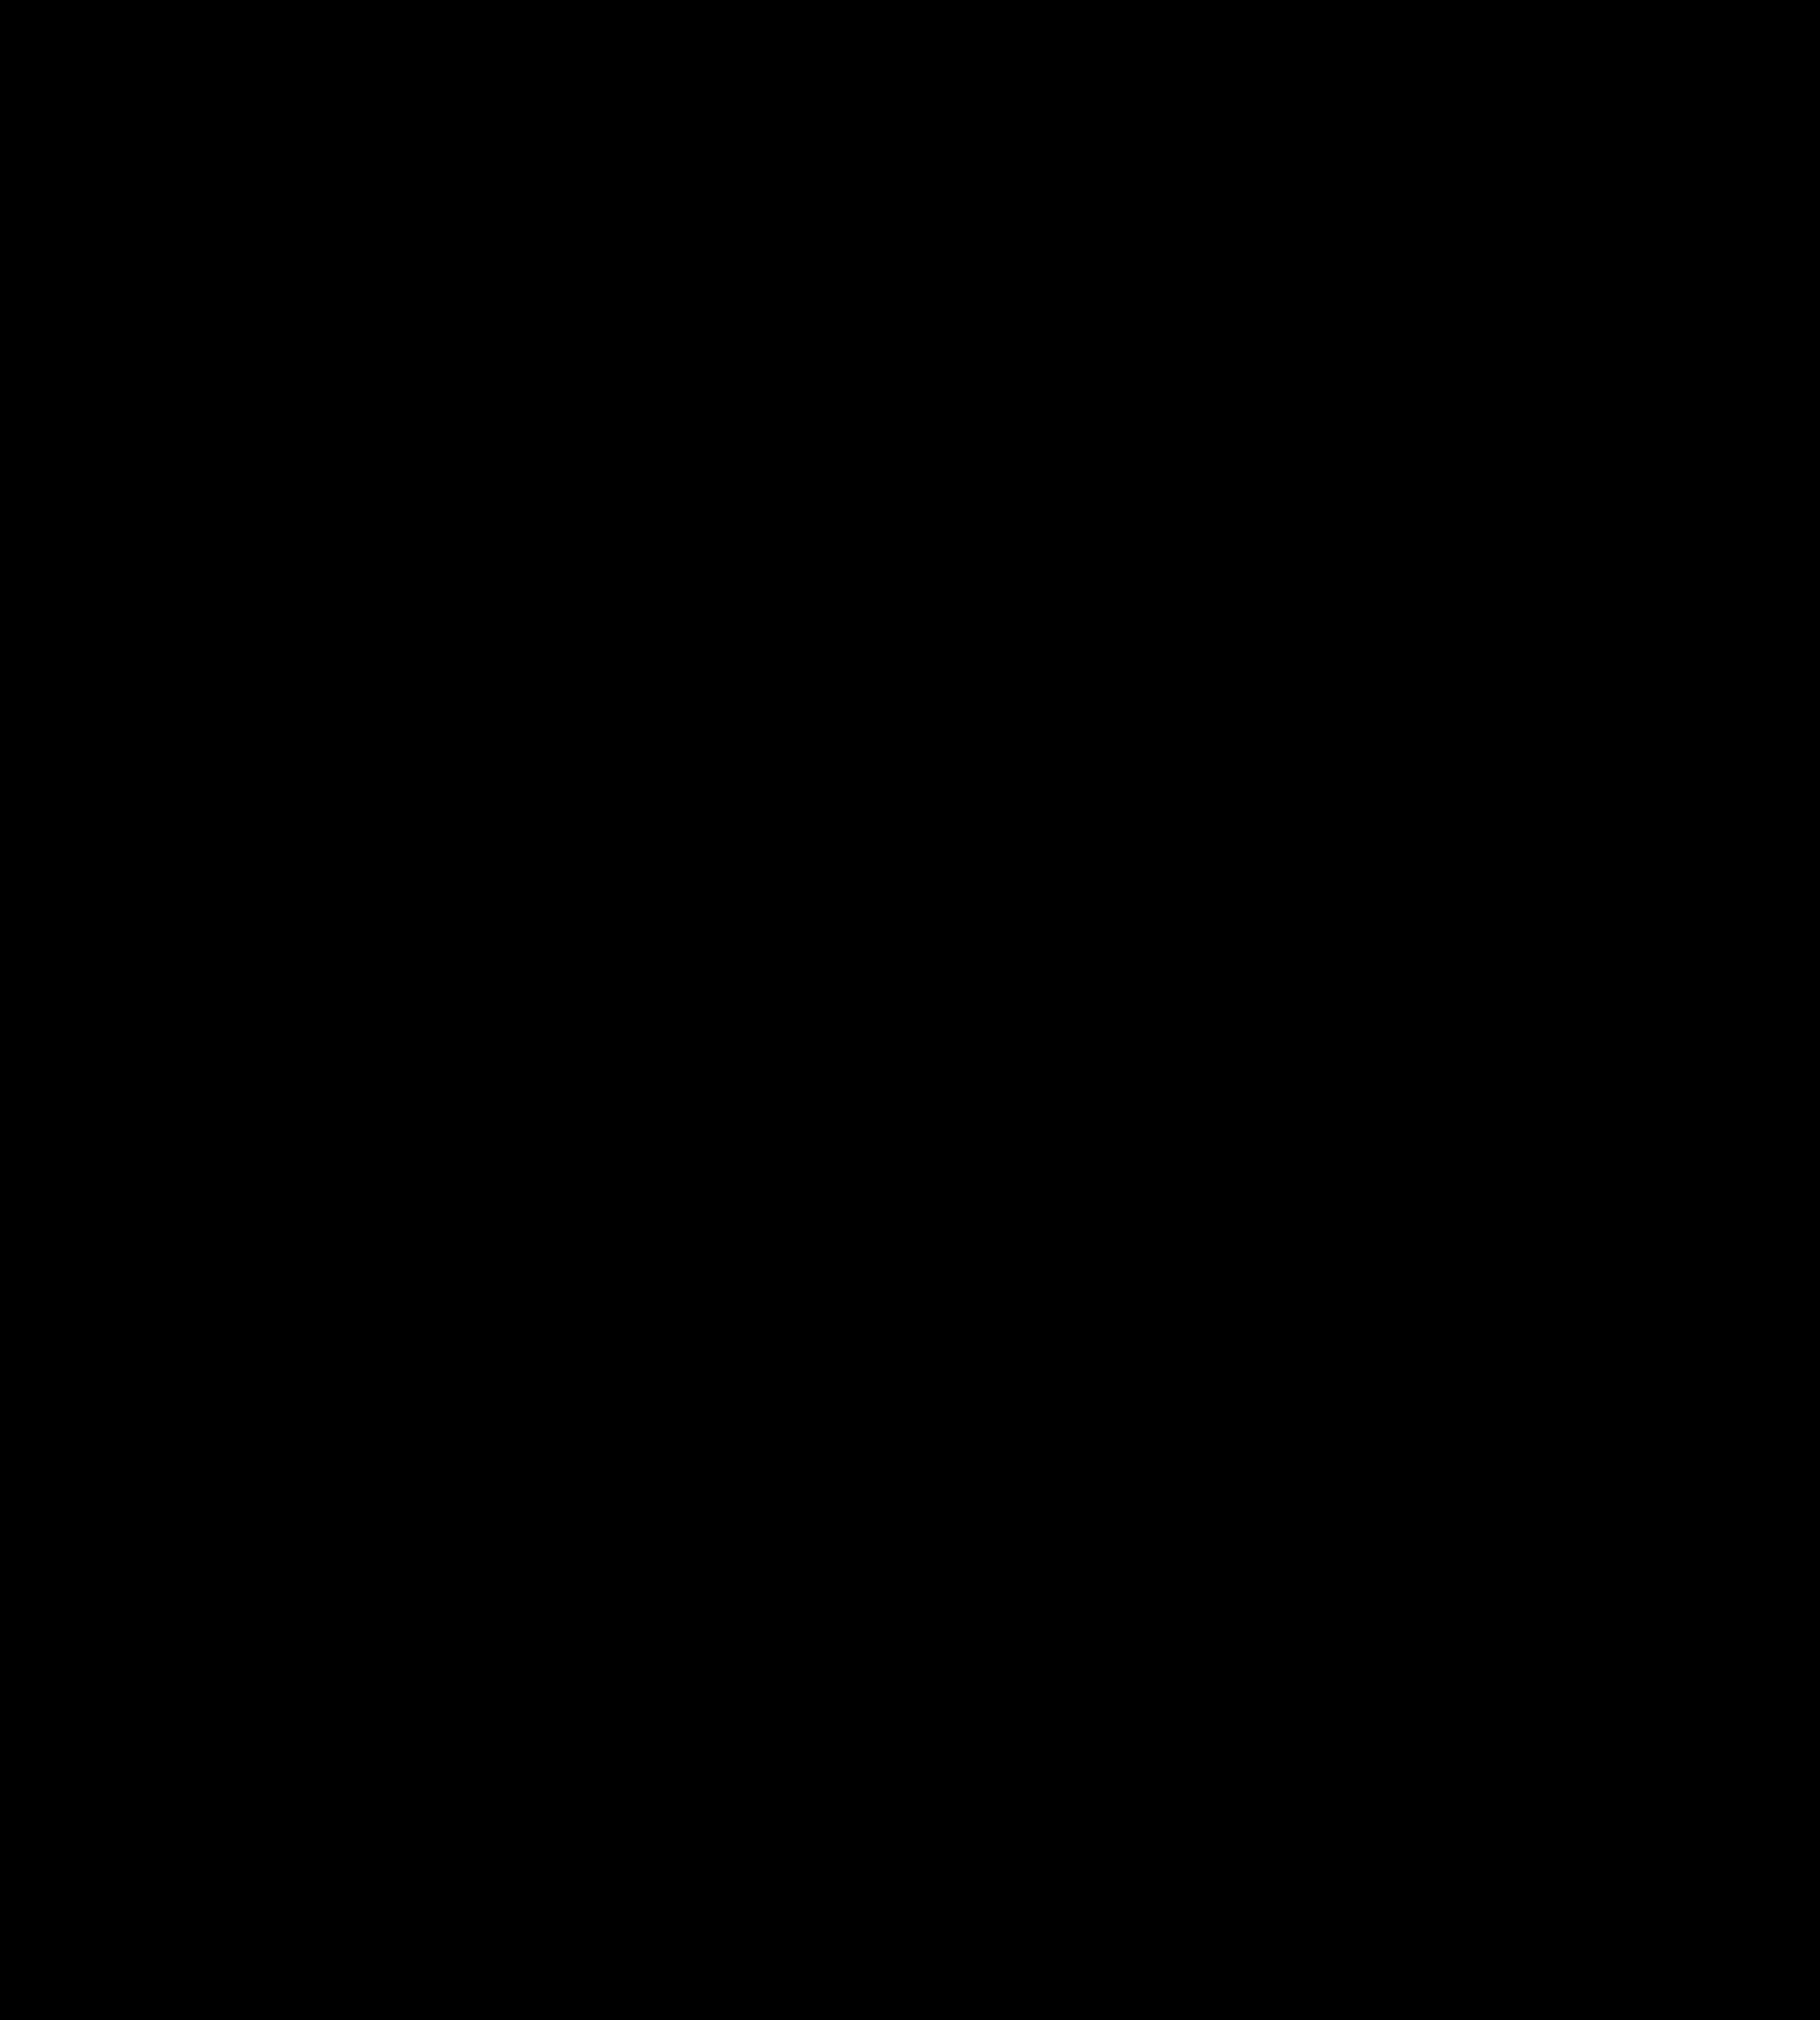 4-Davolls-Logos-7.15.16-01.png